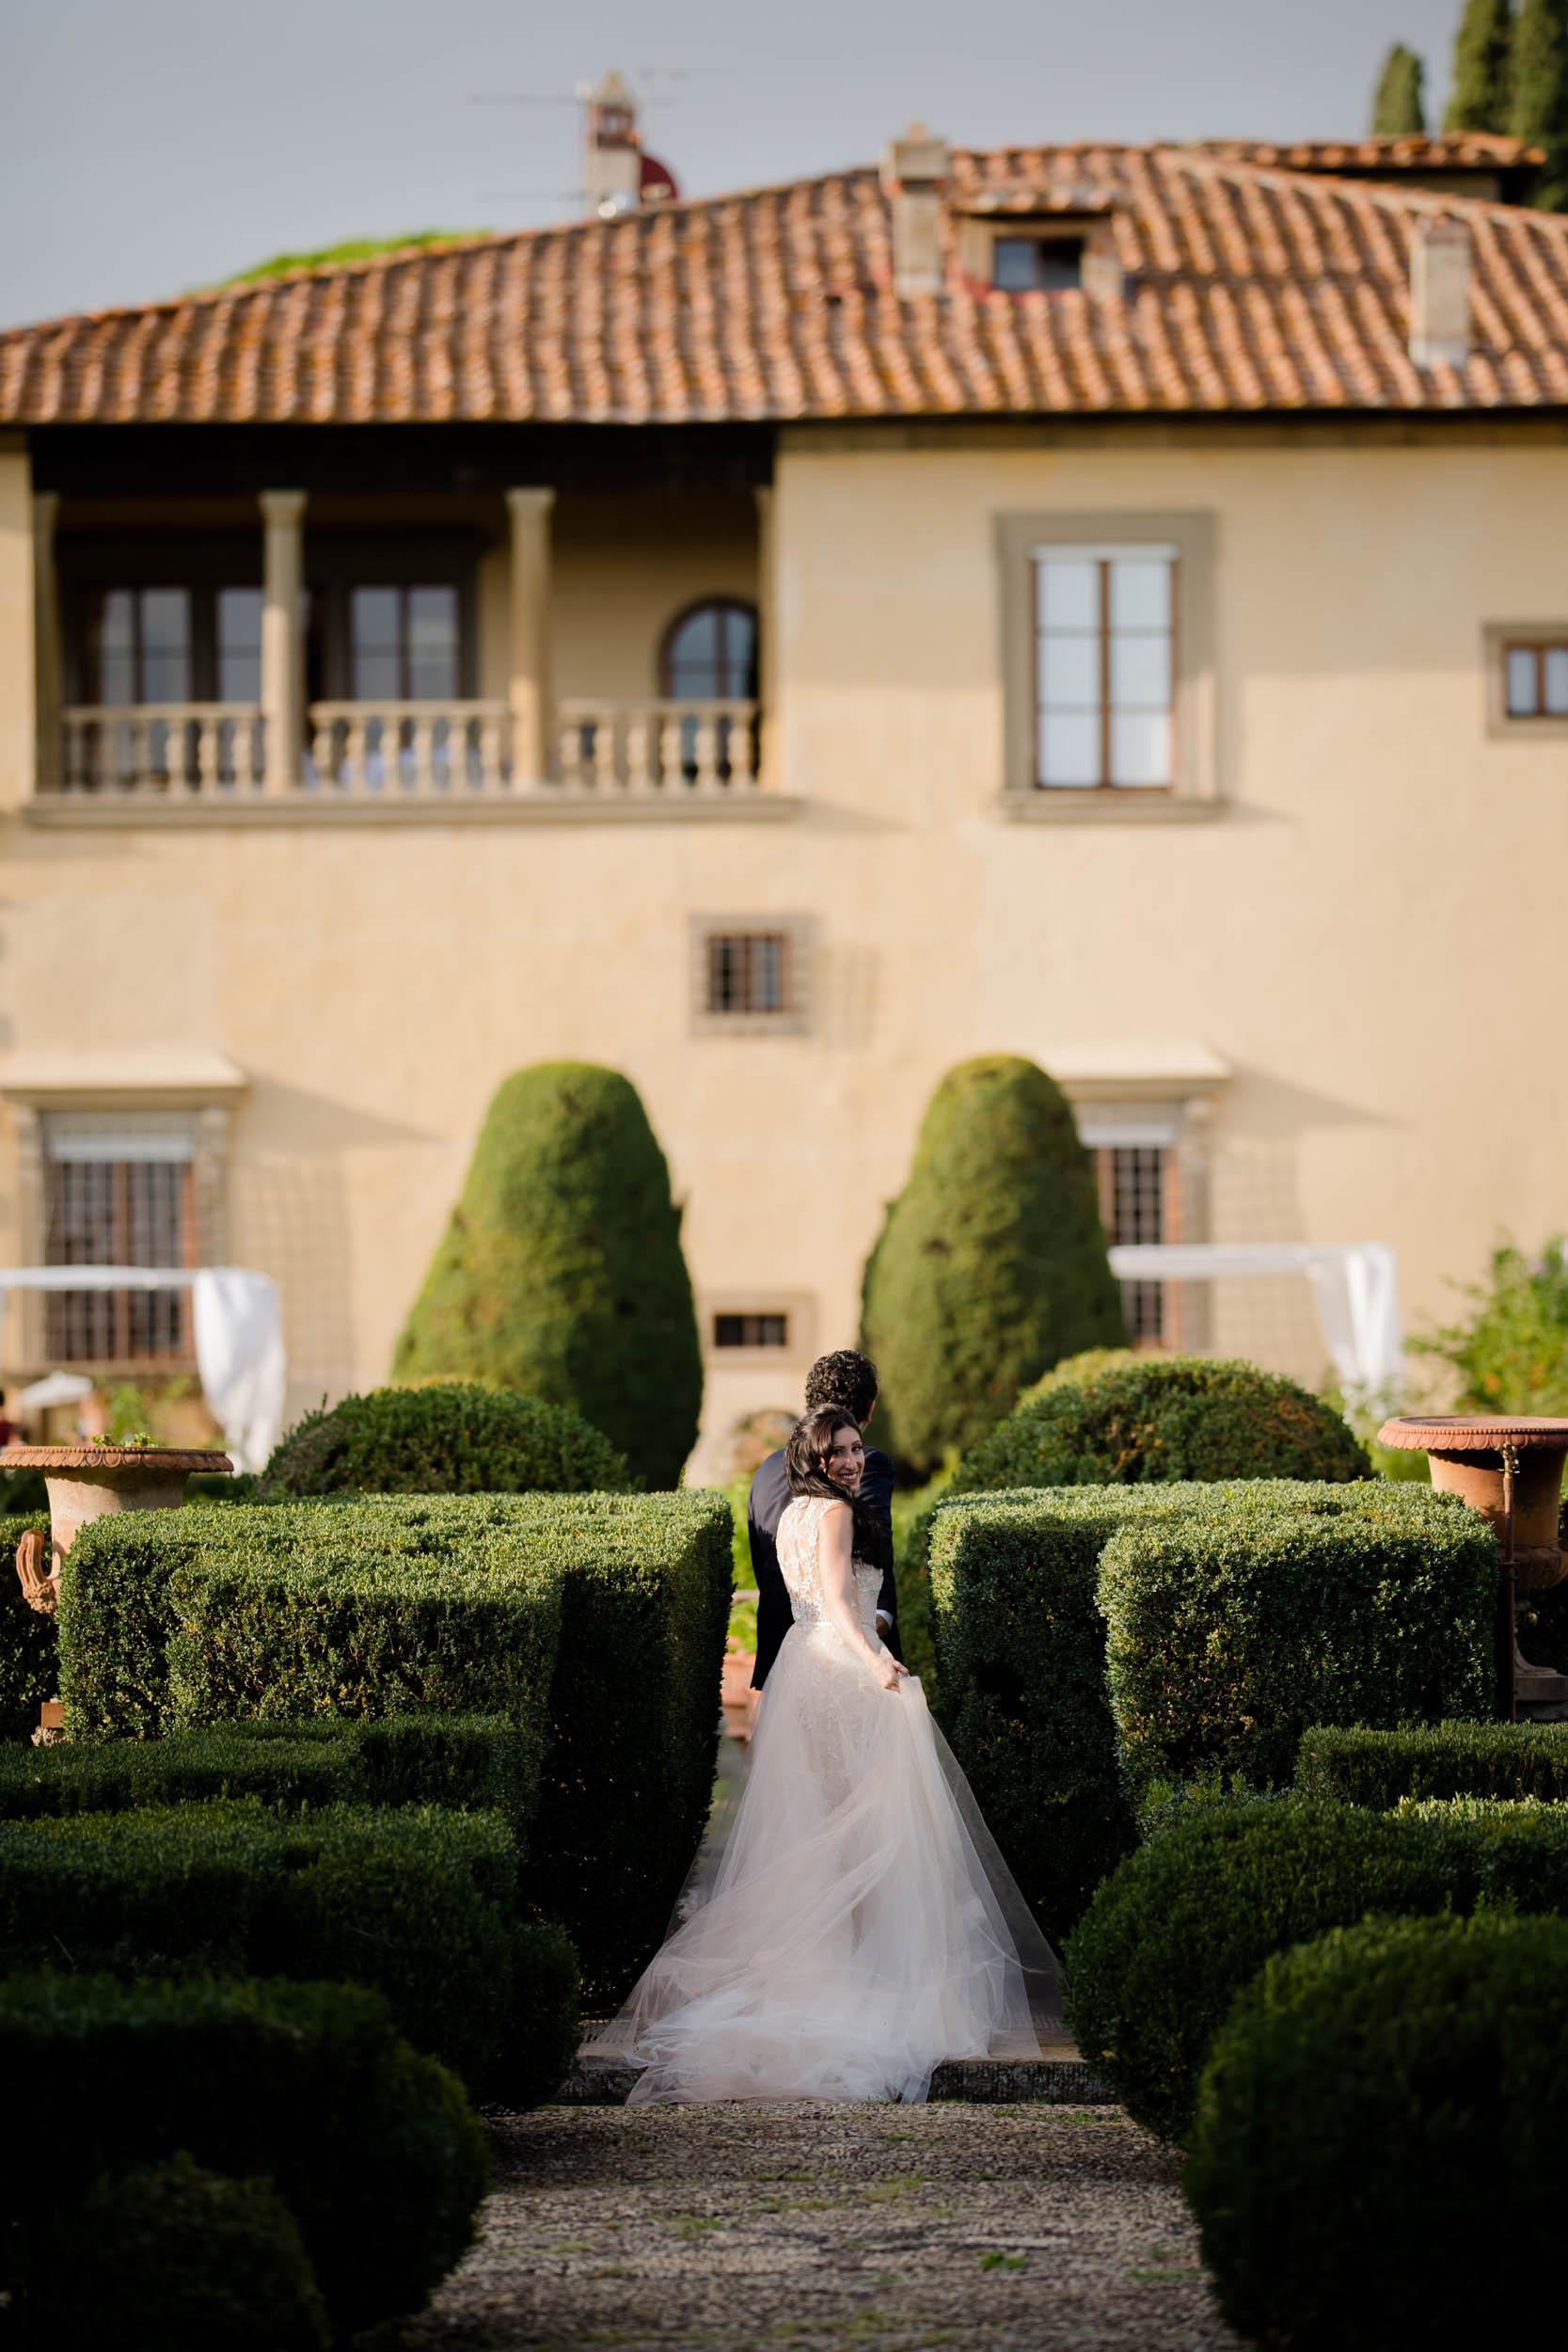 villa-gamberaia-florence-italy-destination-wedding-57.jpg